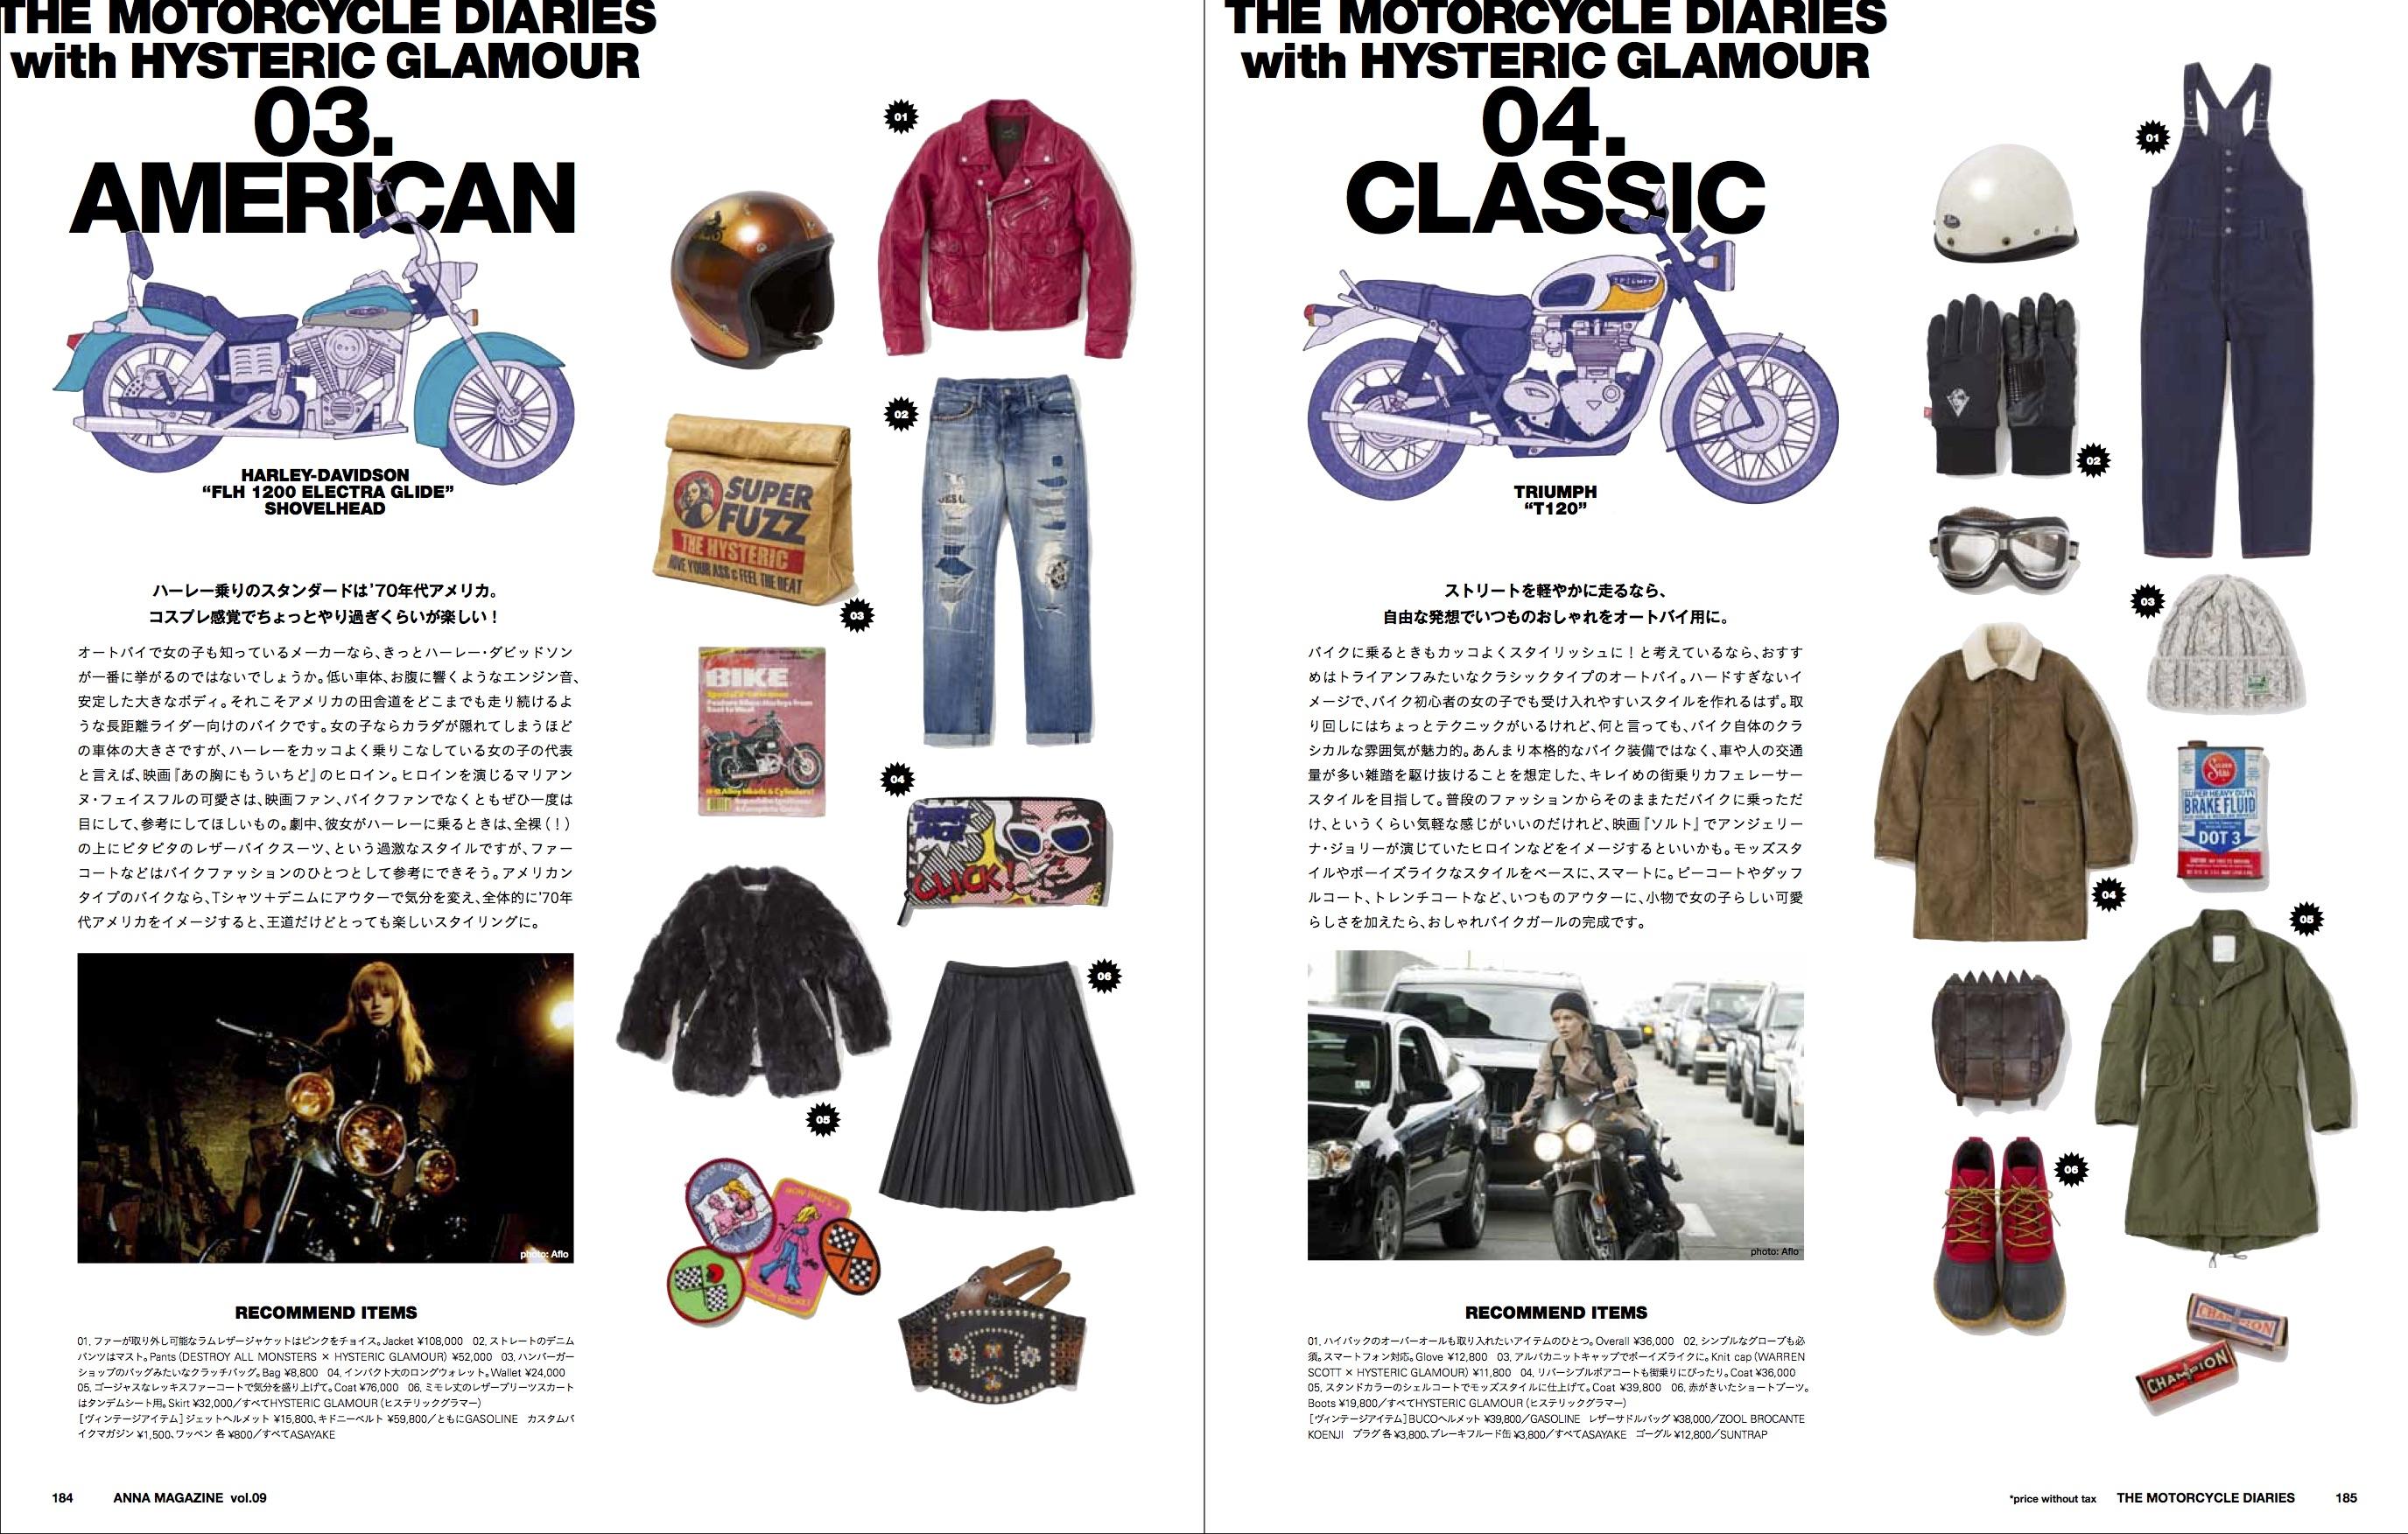 anna magazine vol.9 P92